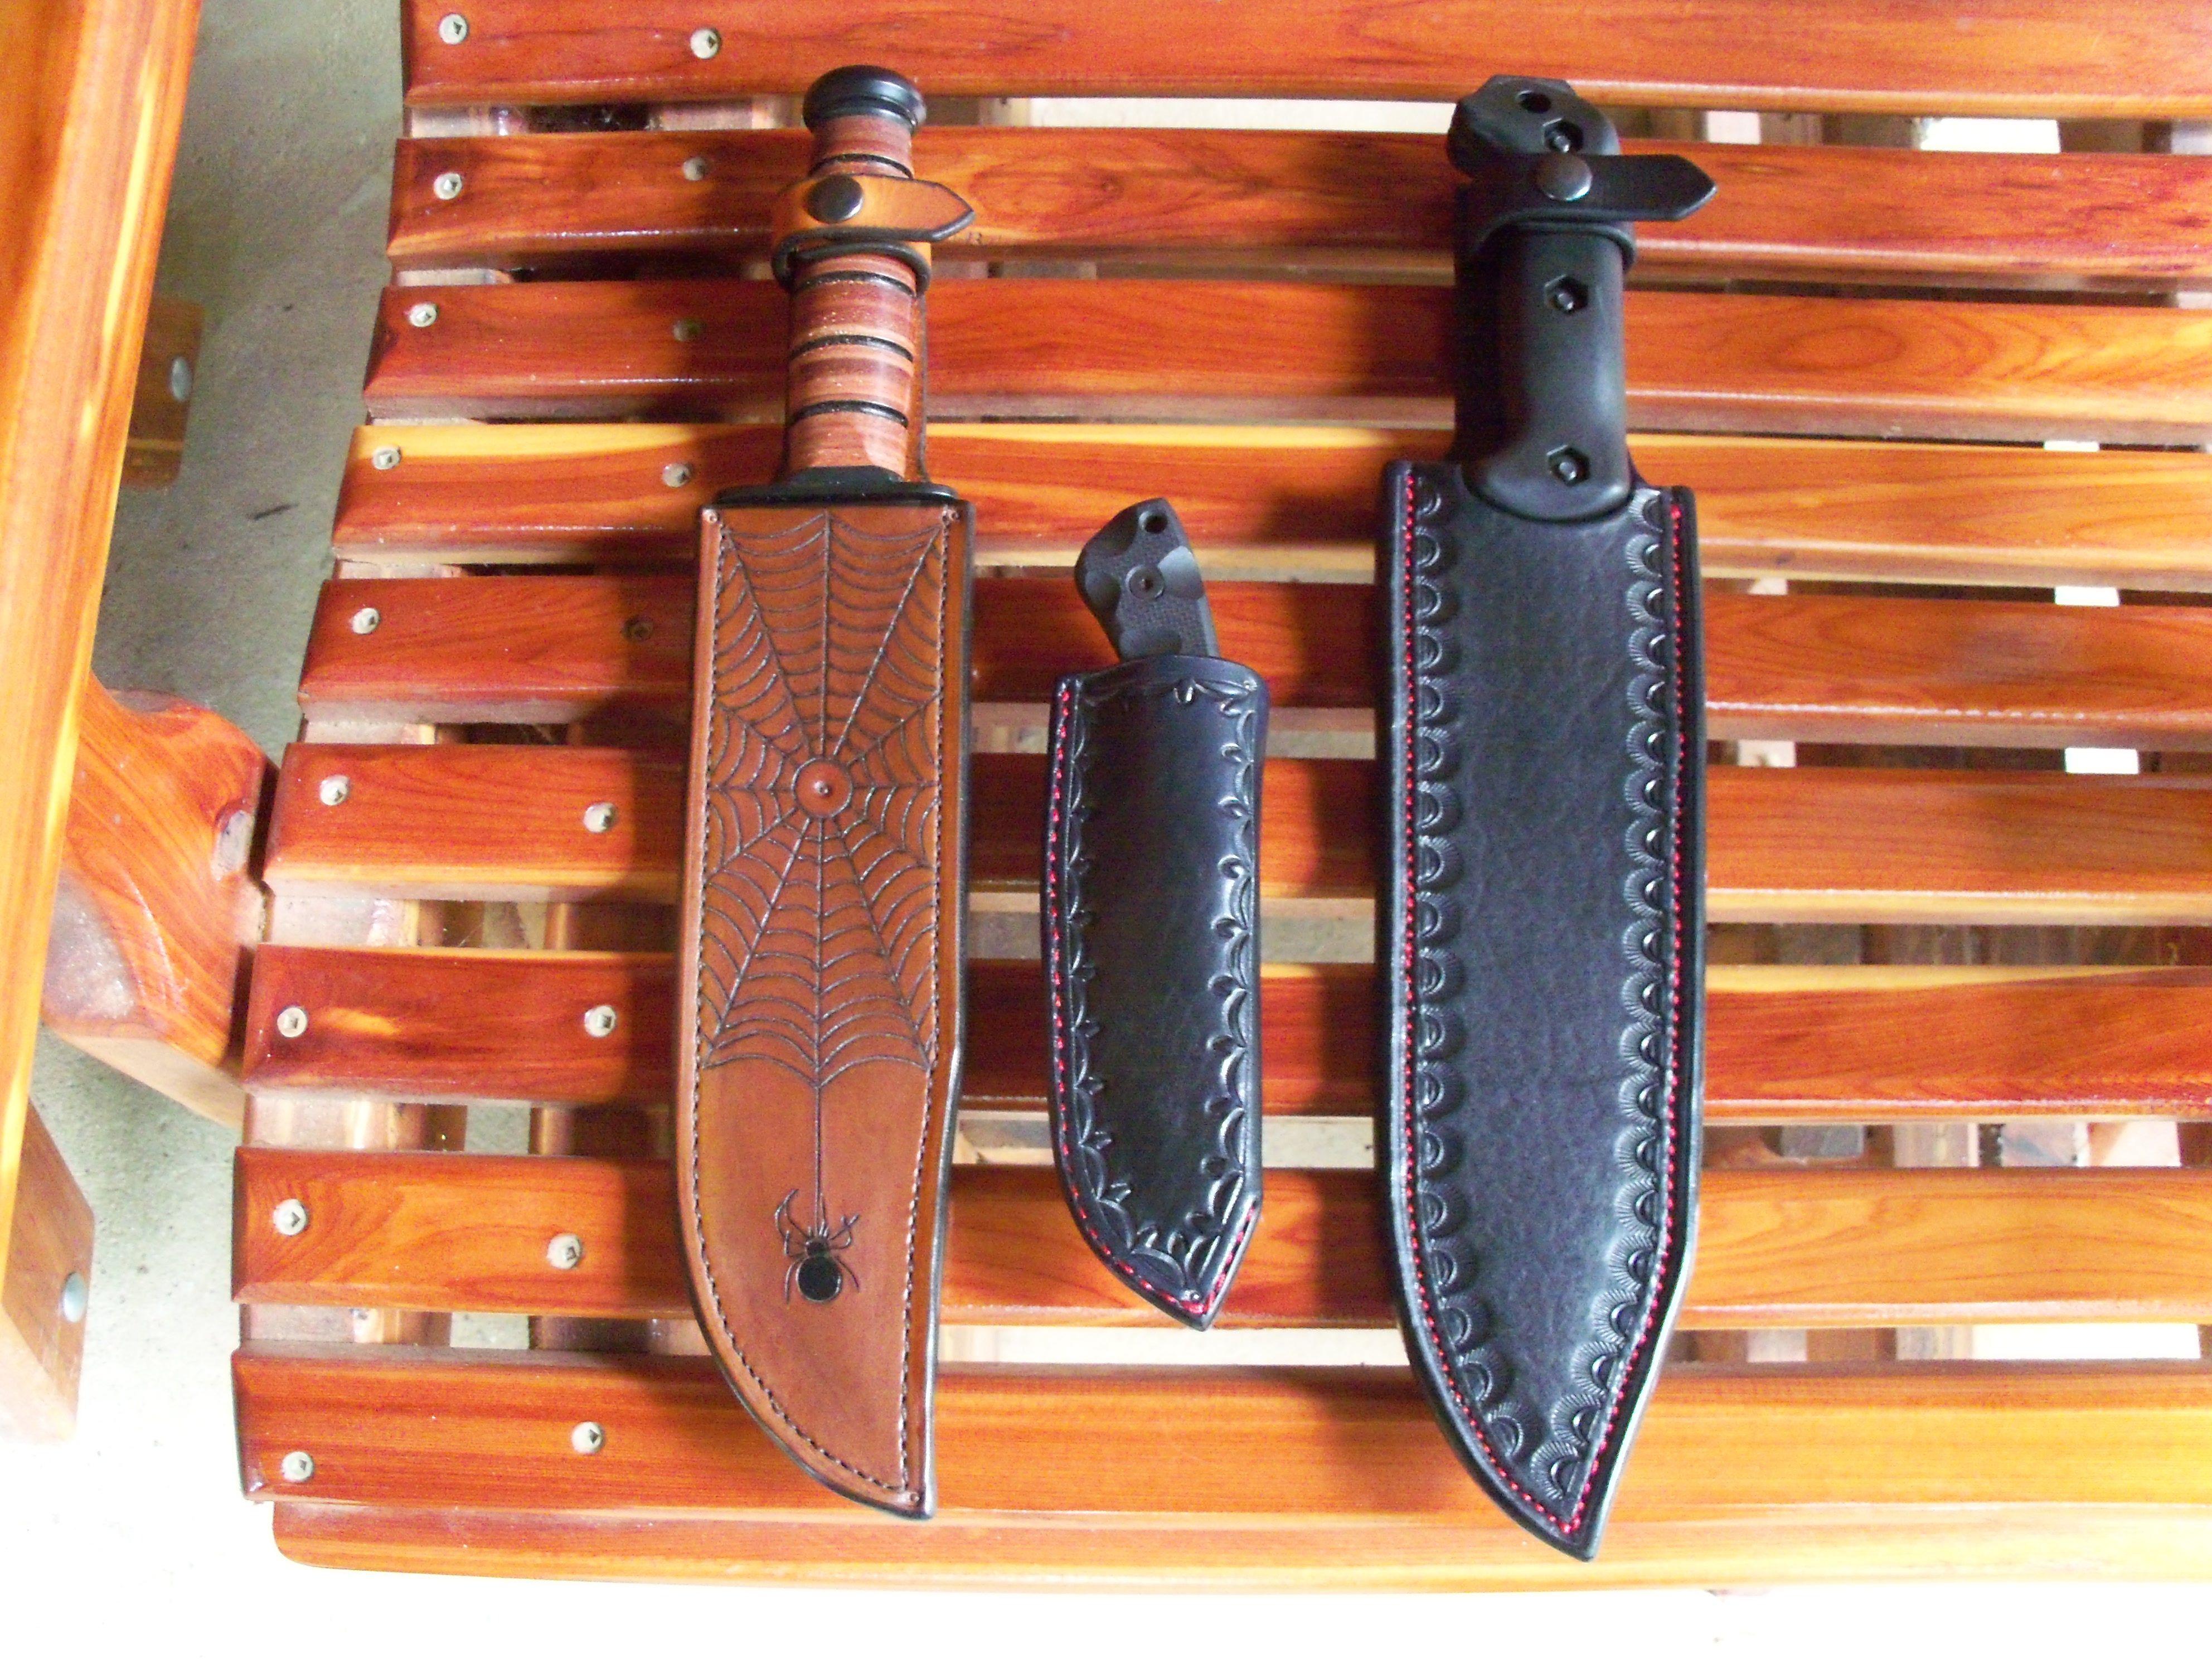 Handmade Custom Made Knife Sheath By Hubbard Leather Custommade Com